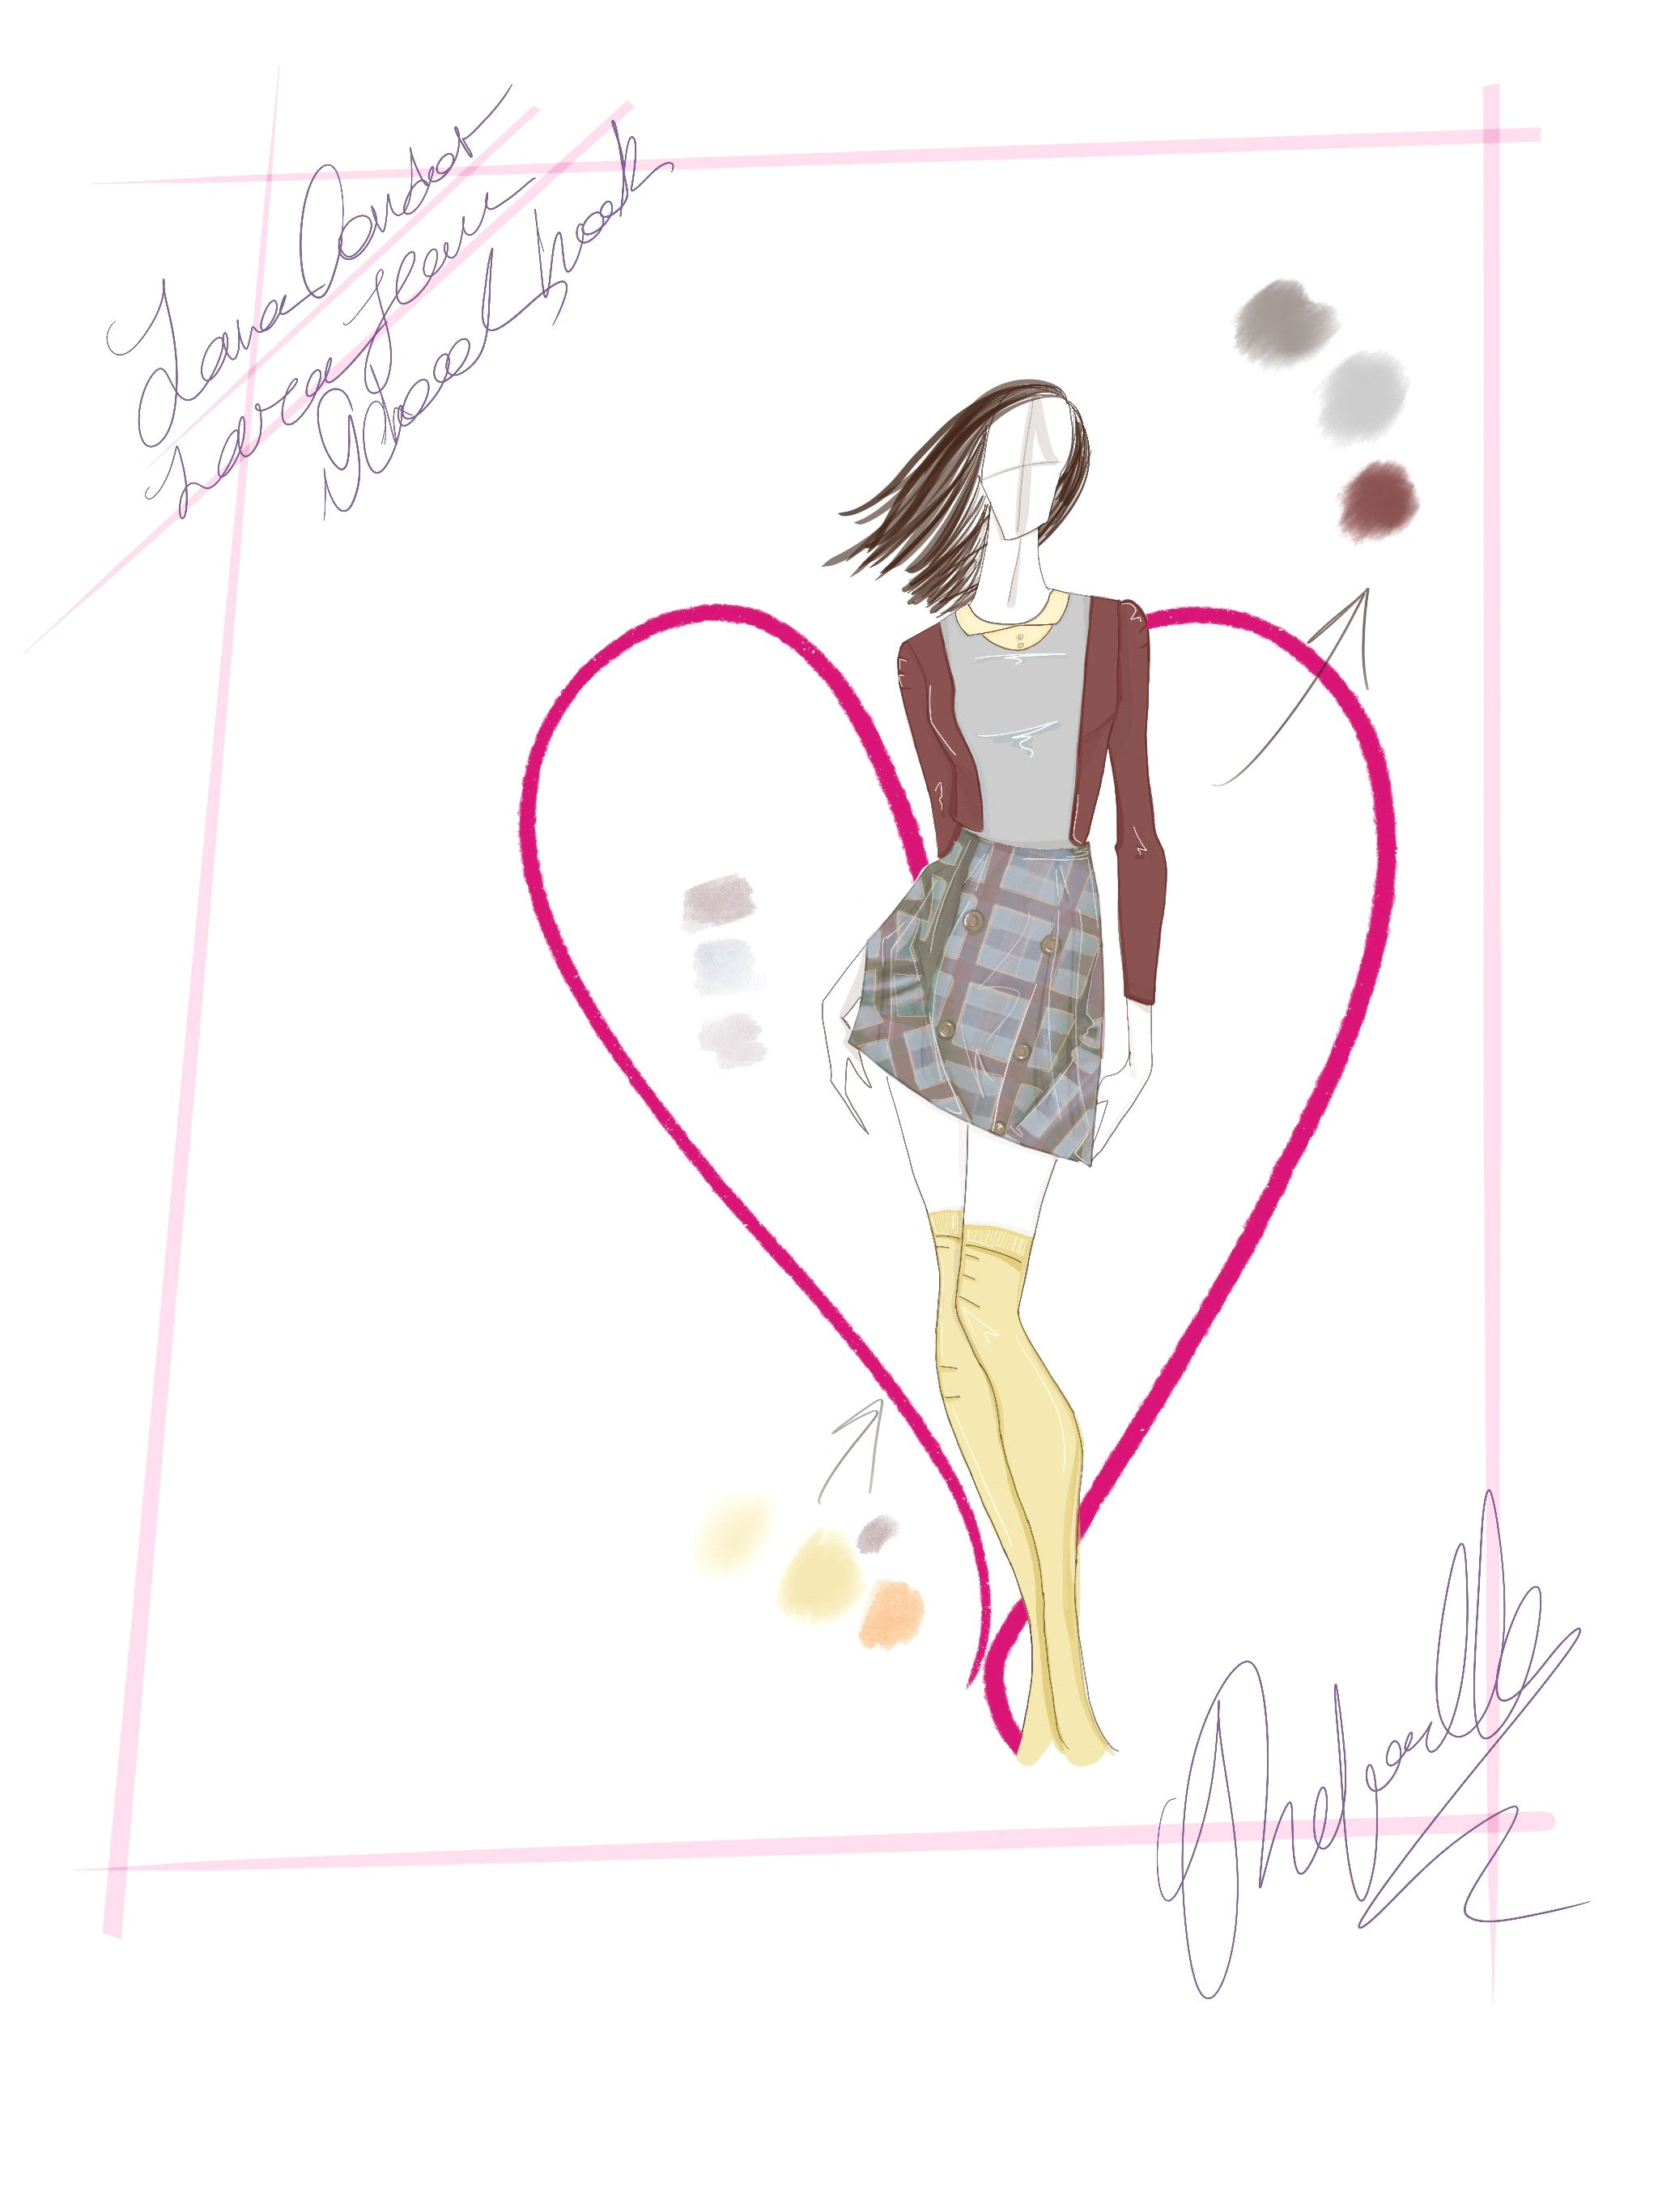 Sketch by Rafaella Rabinovich / Courtesy